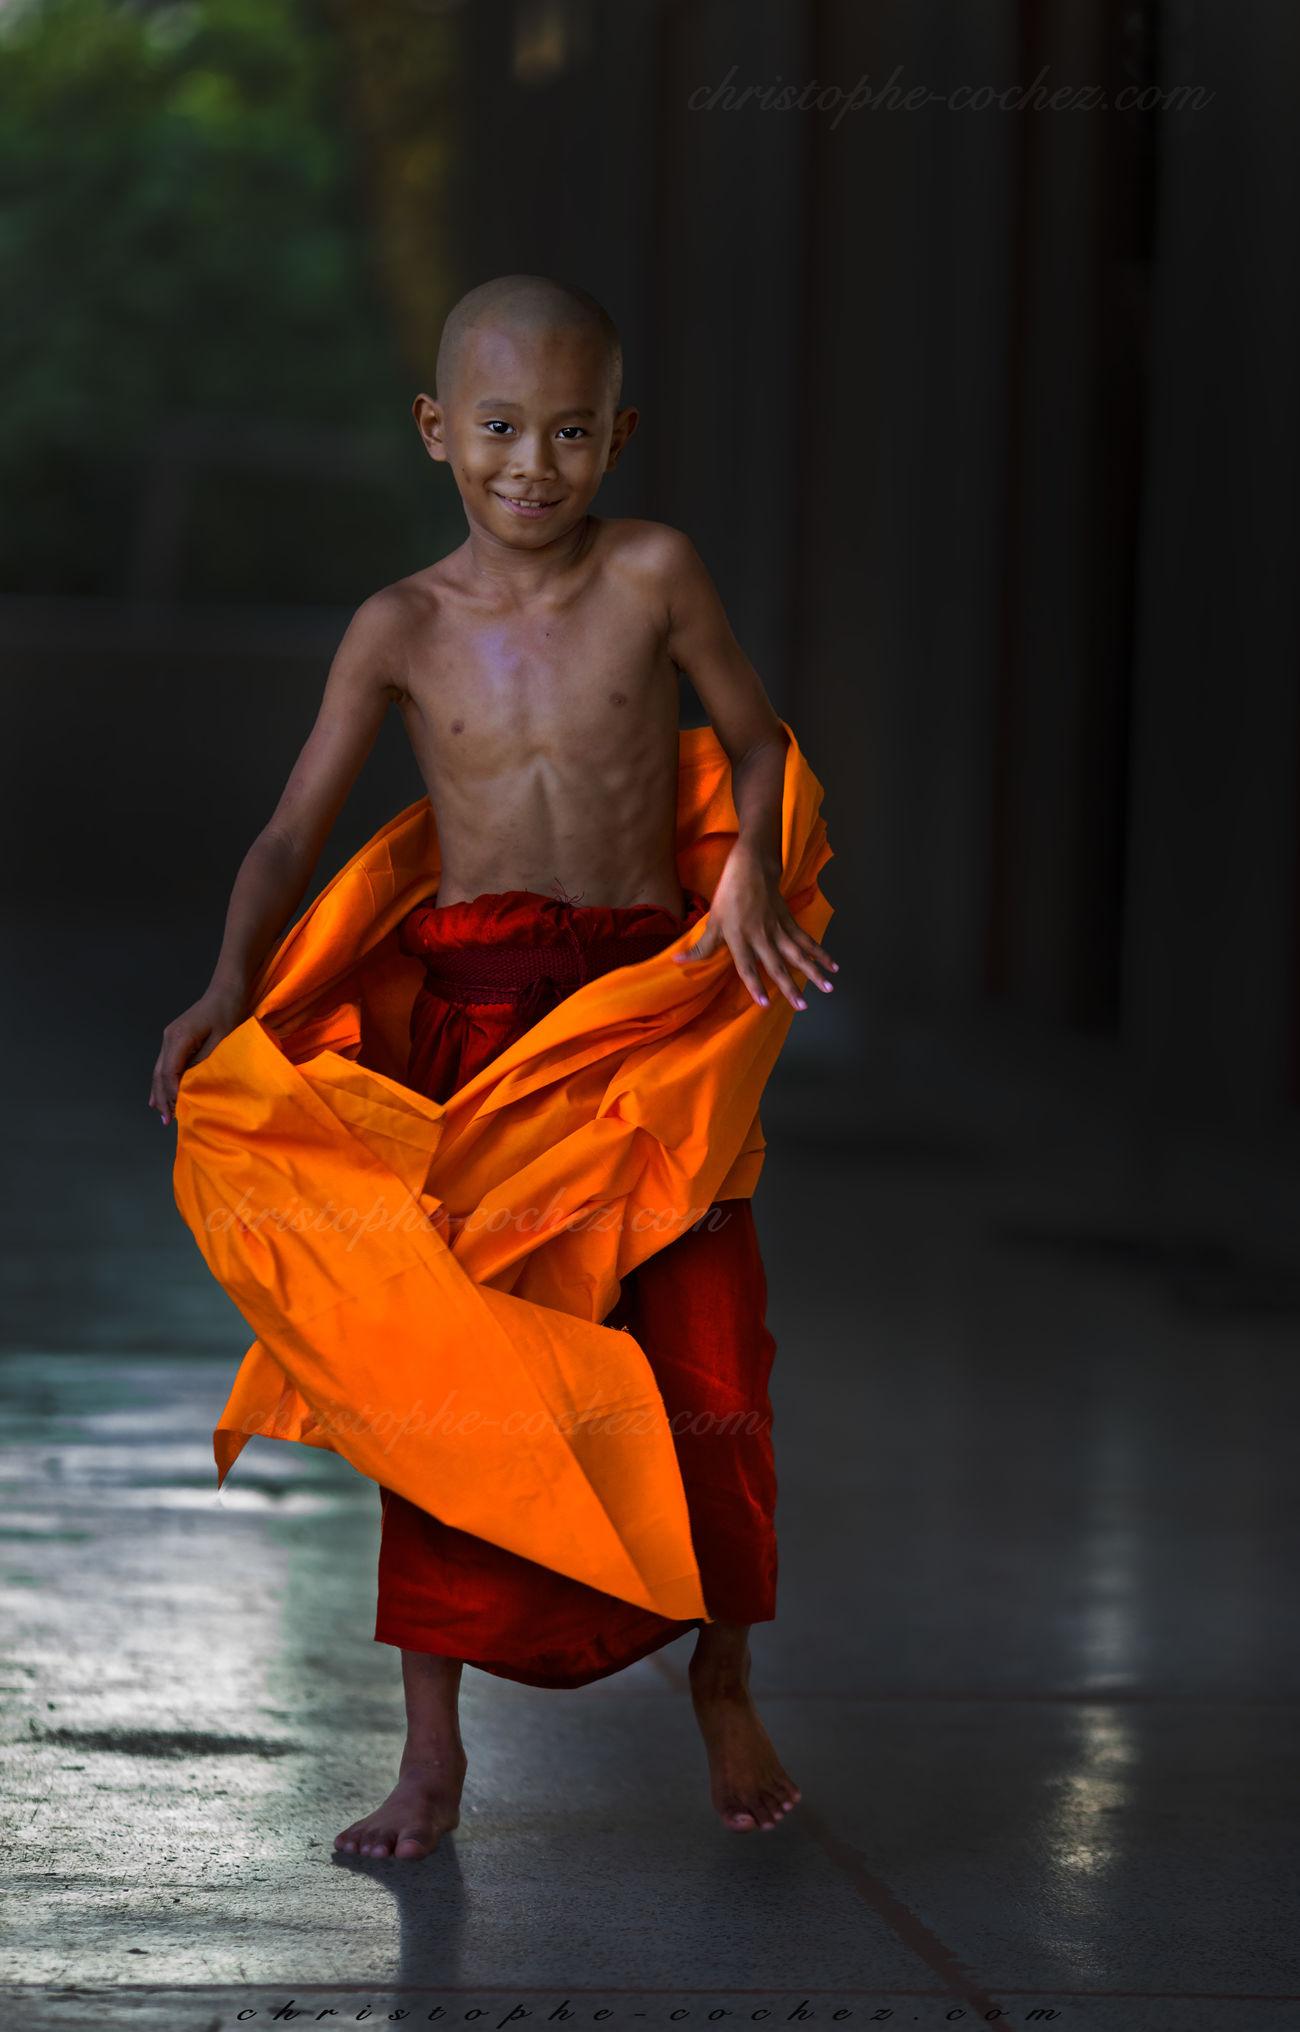 burmes monk in wat thail wattanaram maesot thailand Birman  Birmania Birmanie Birmanie Bonze Bouddhisme Bouddhiste Buddhism Buddhist Burgers Burma Holydays Maesot Monk  Myanmar Myawaddy Novice Monk Sunset Teravada Thailand Thaïlande Travel Voyage Wat Thail Wattanaram Wat Wattanaram